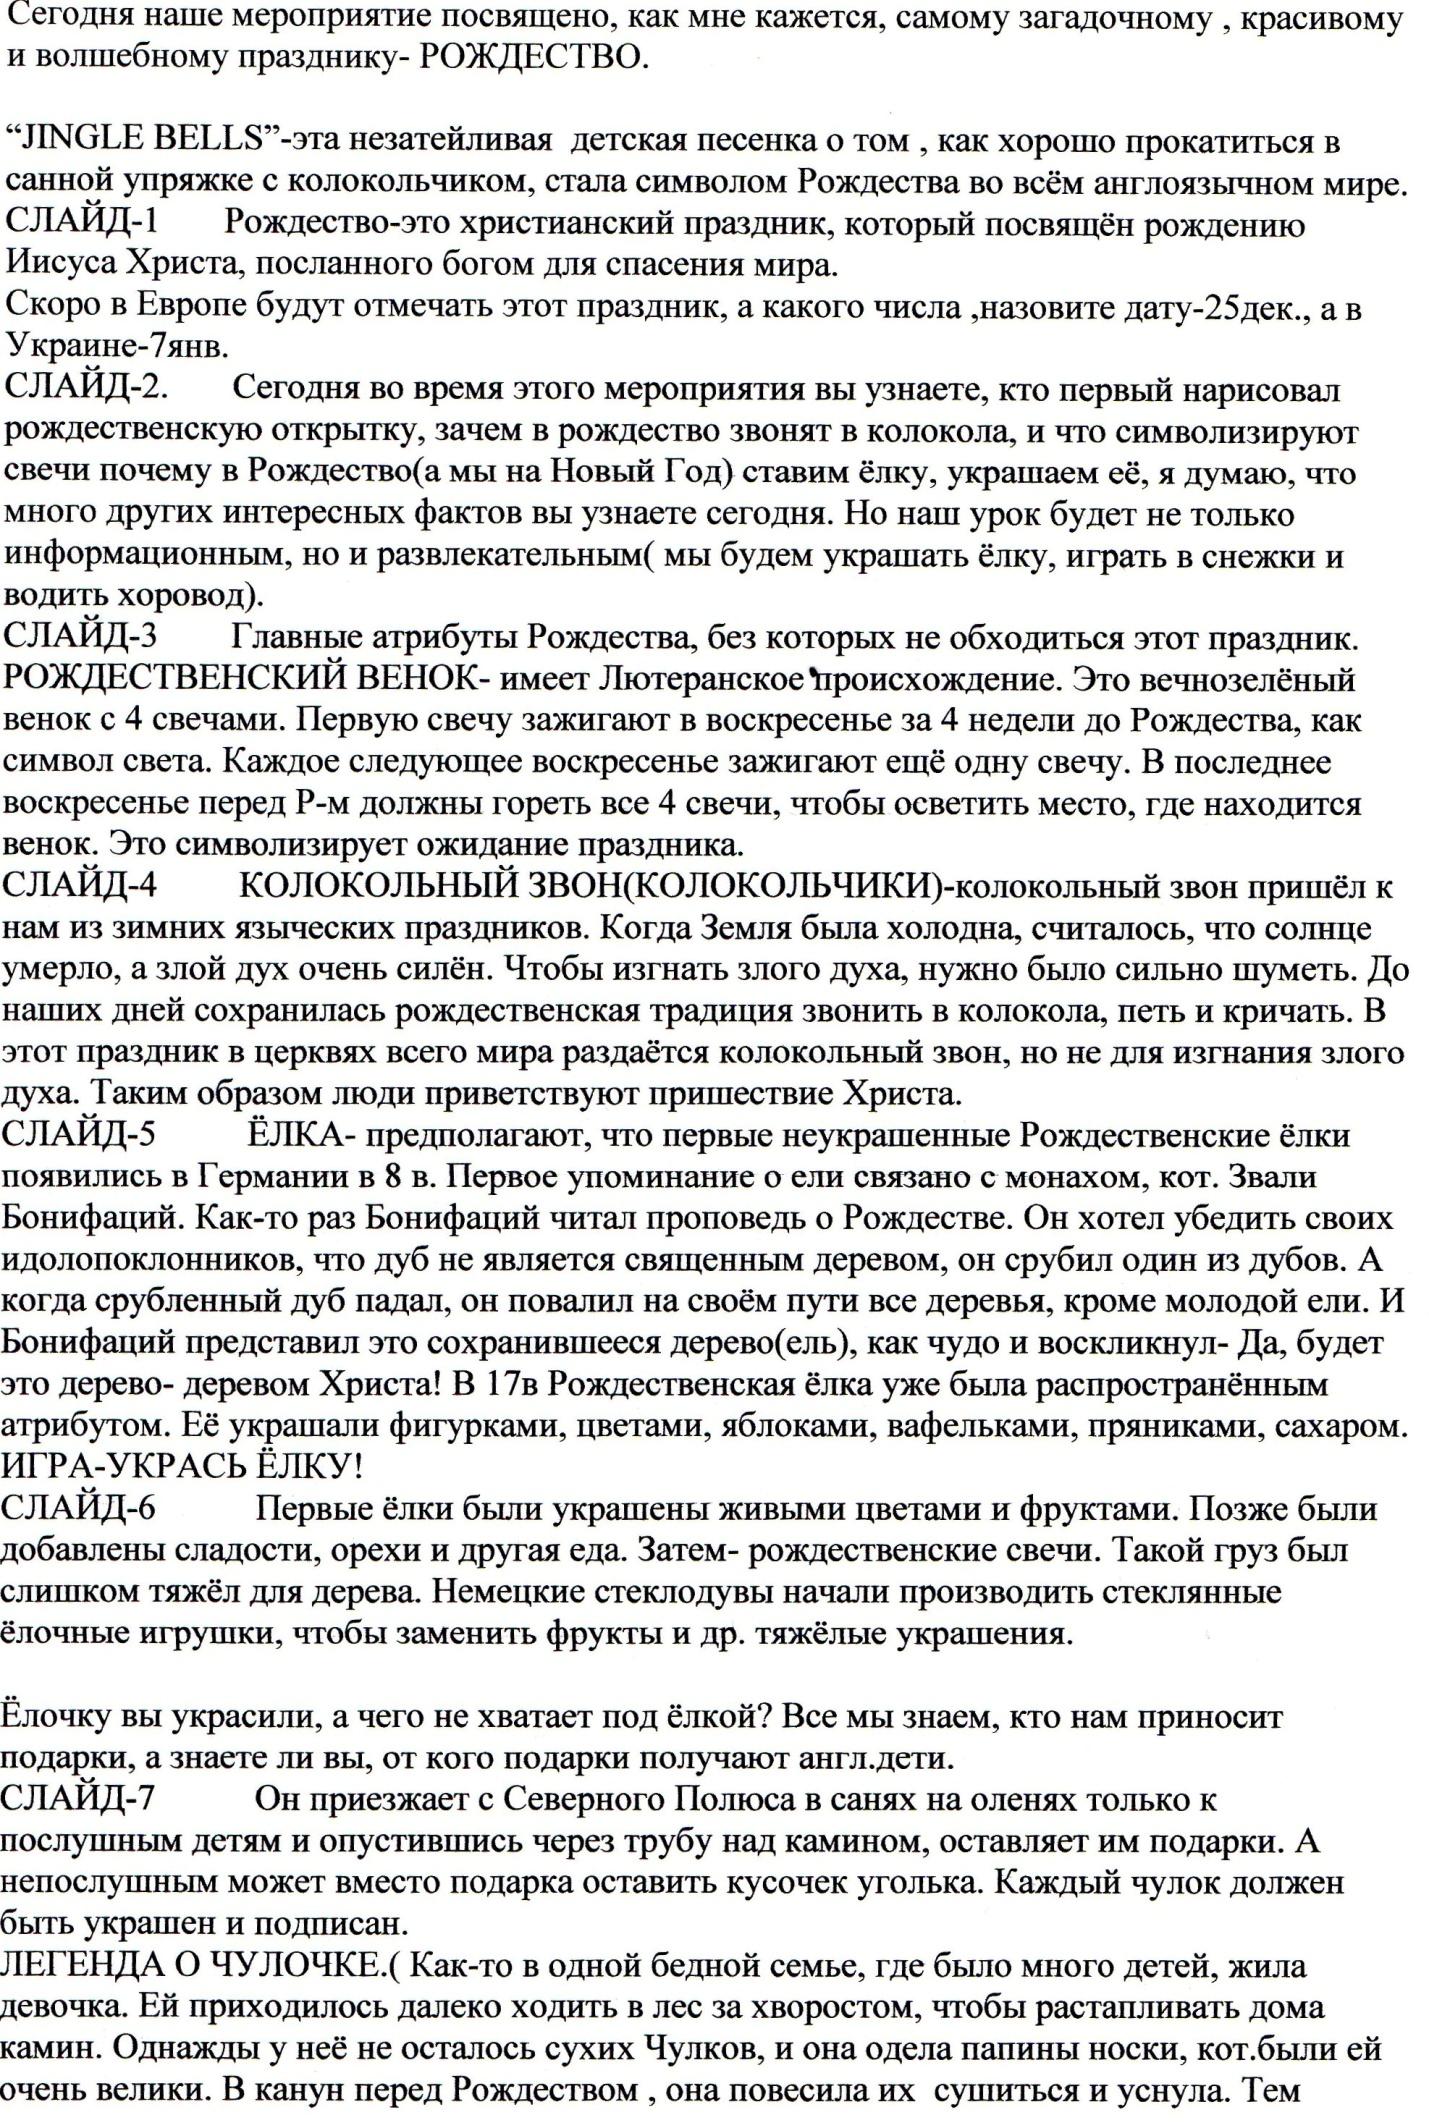 C:\Users\user\Desktop\img016.jpg